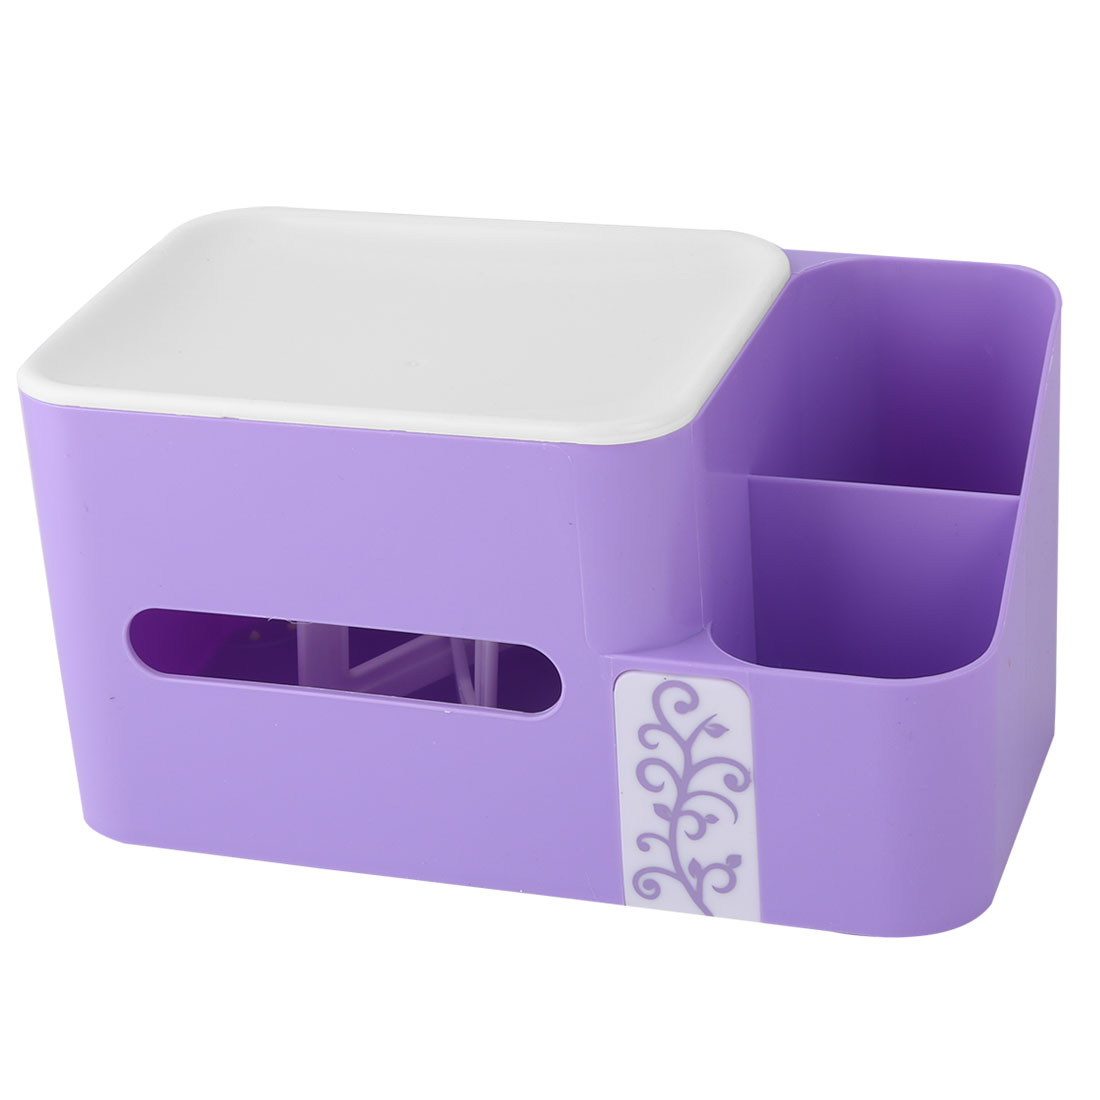 Bathroom Kitchen Plastic Tissue Paper Napkin Container Storage Box Holder Purple